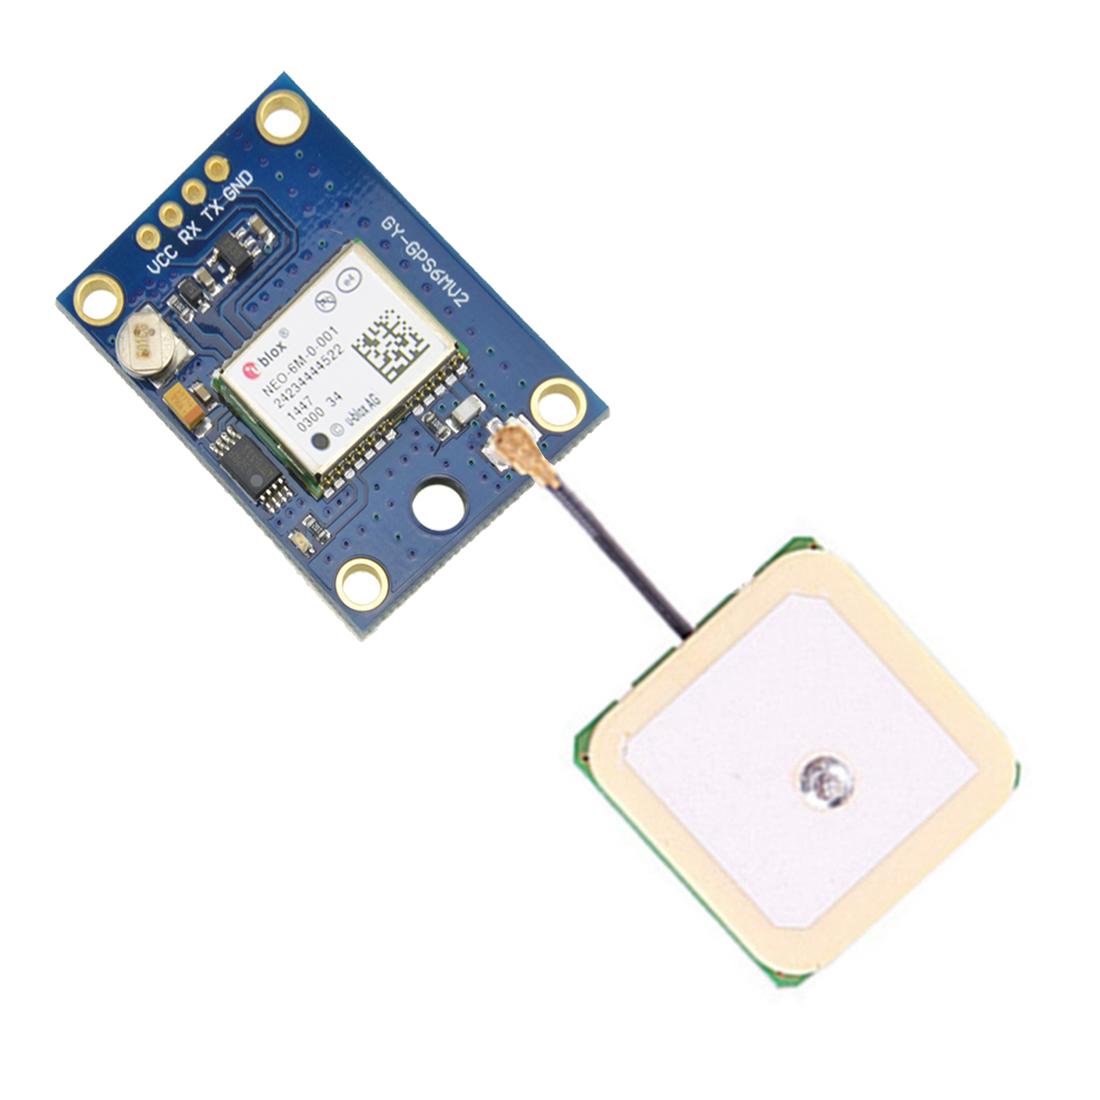 Neu Ublox NEO-6M GPS Module Aircraft Flight Controller für Arduino MWC IMU APM2